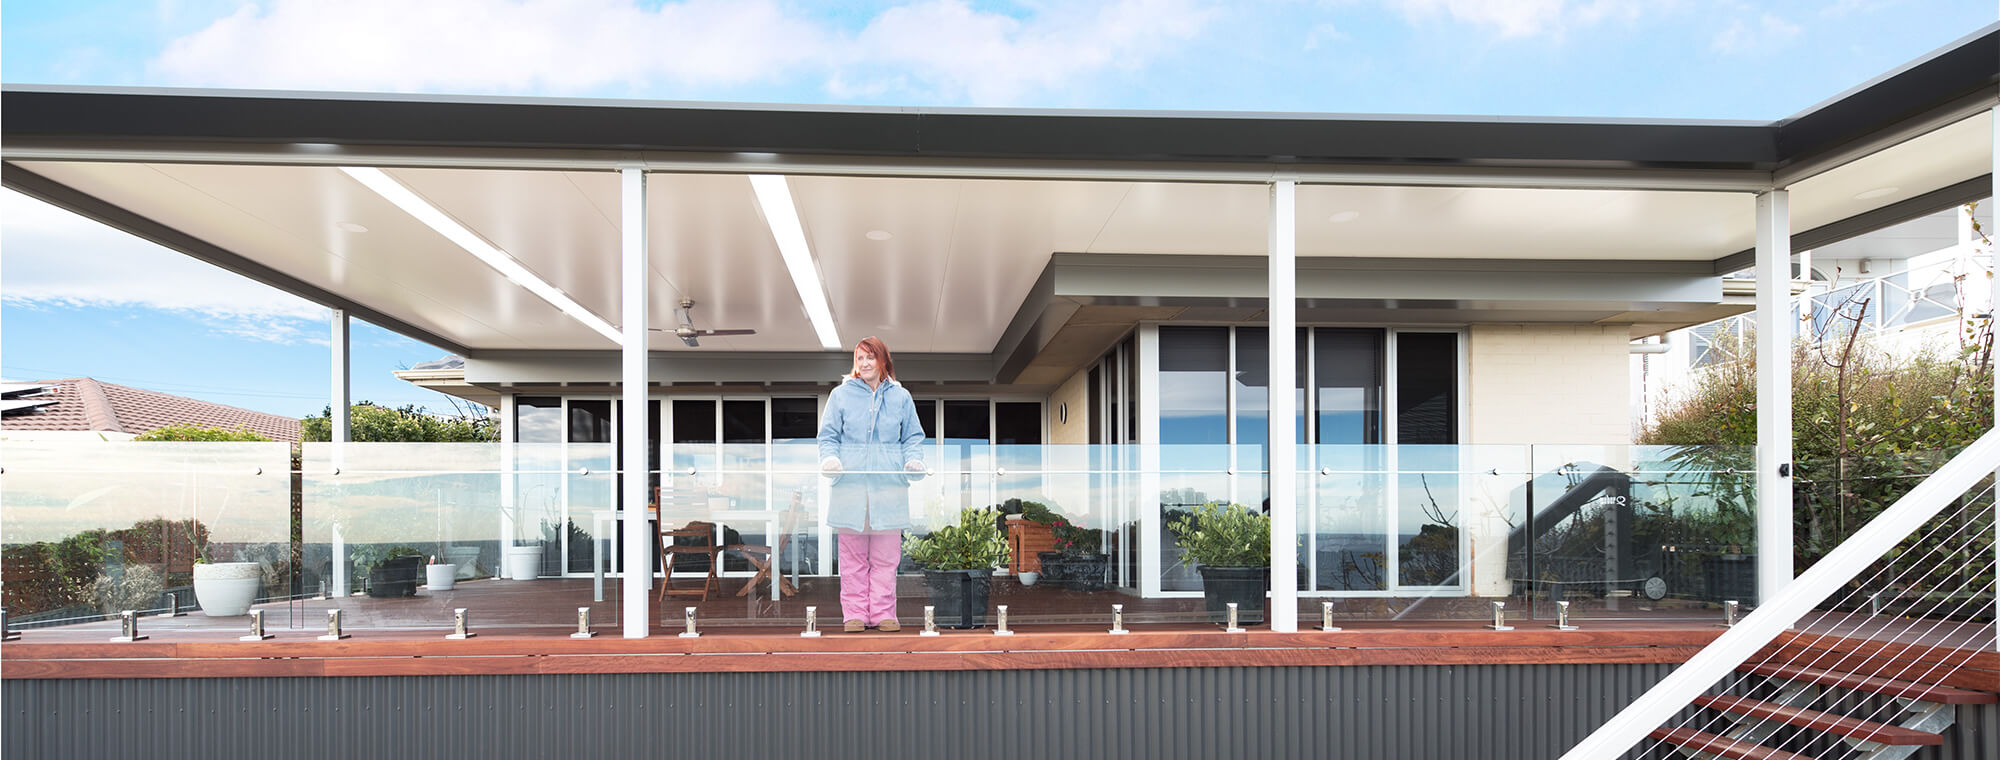 Adelaide Roofing Contractor Pergolas Gutters Verandahs